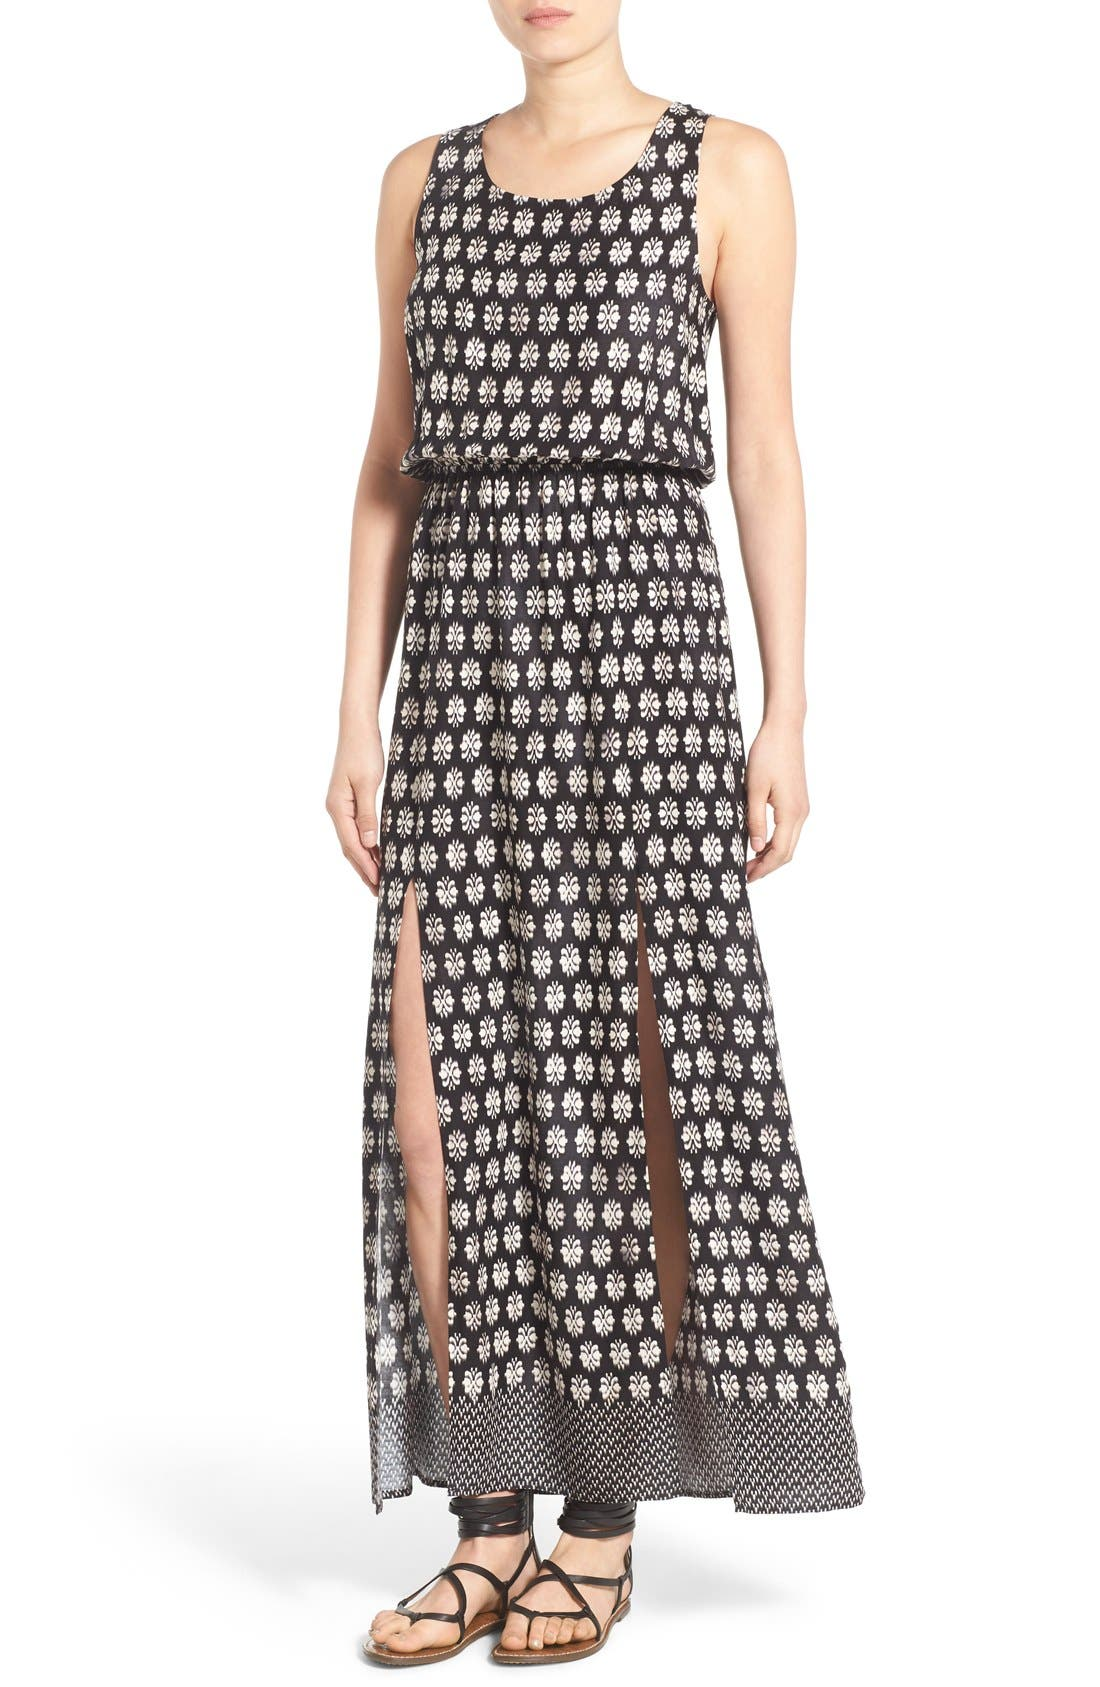 Main Image - Mimi Chica Print Lace Up Maxi Dress